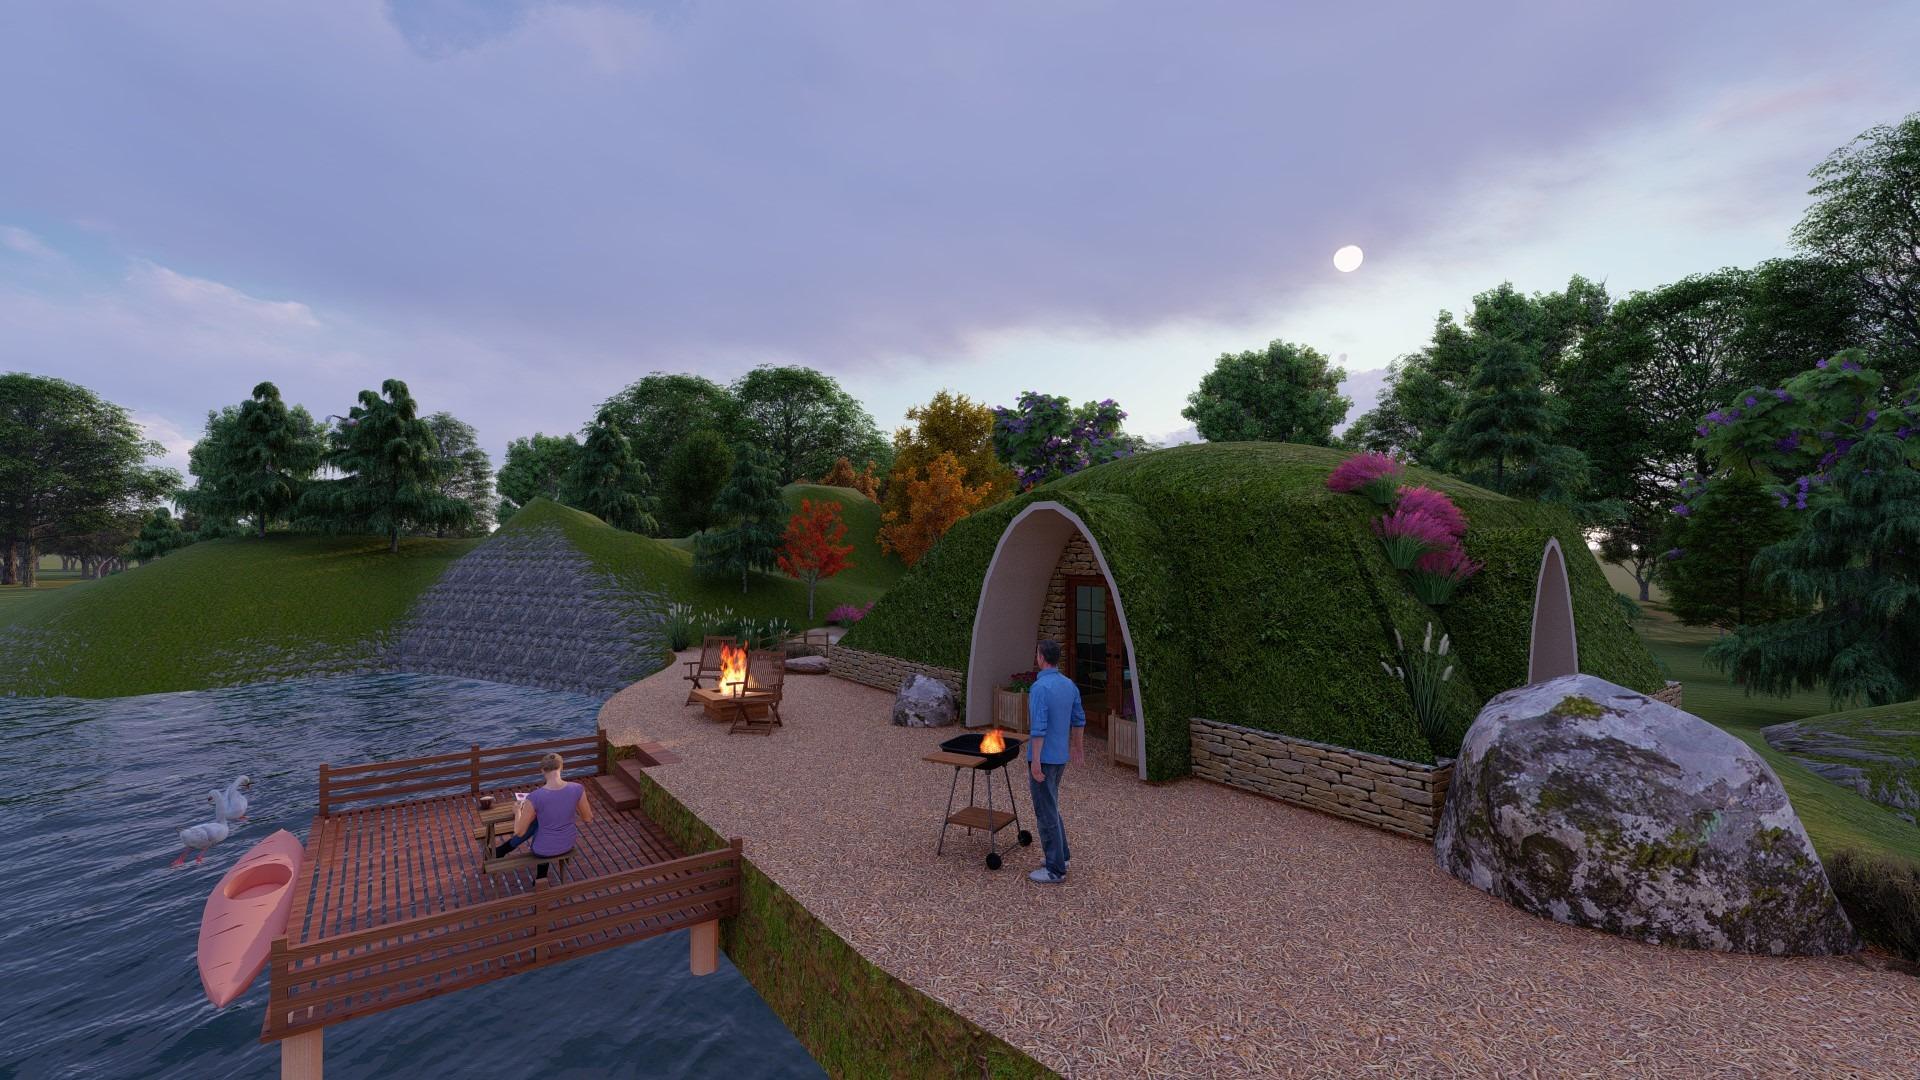 Artfulparks - Visitor Lodge with Lake Dock